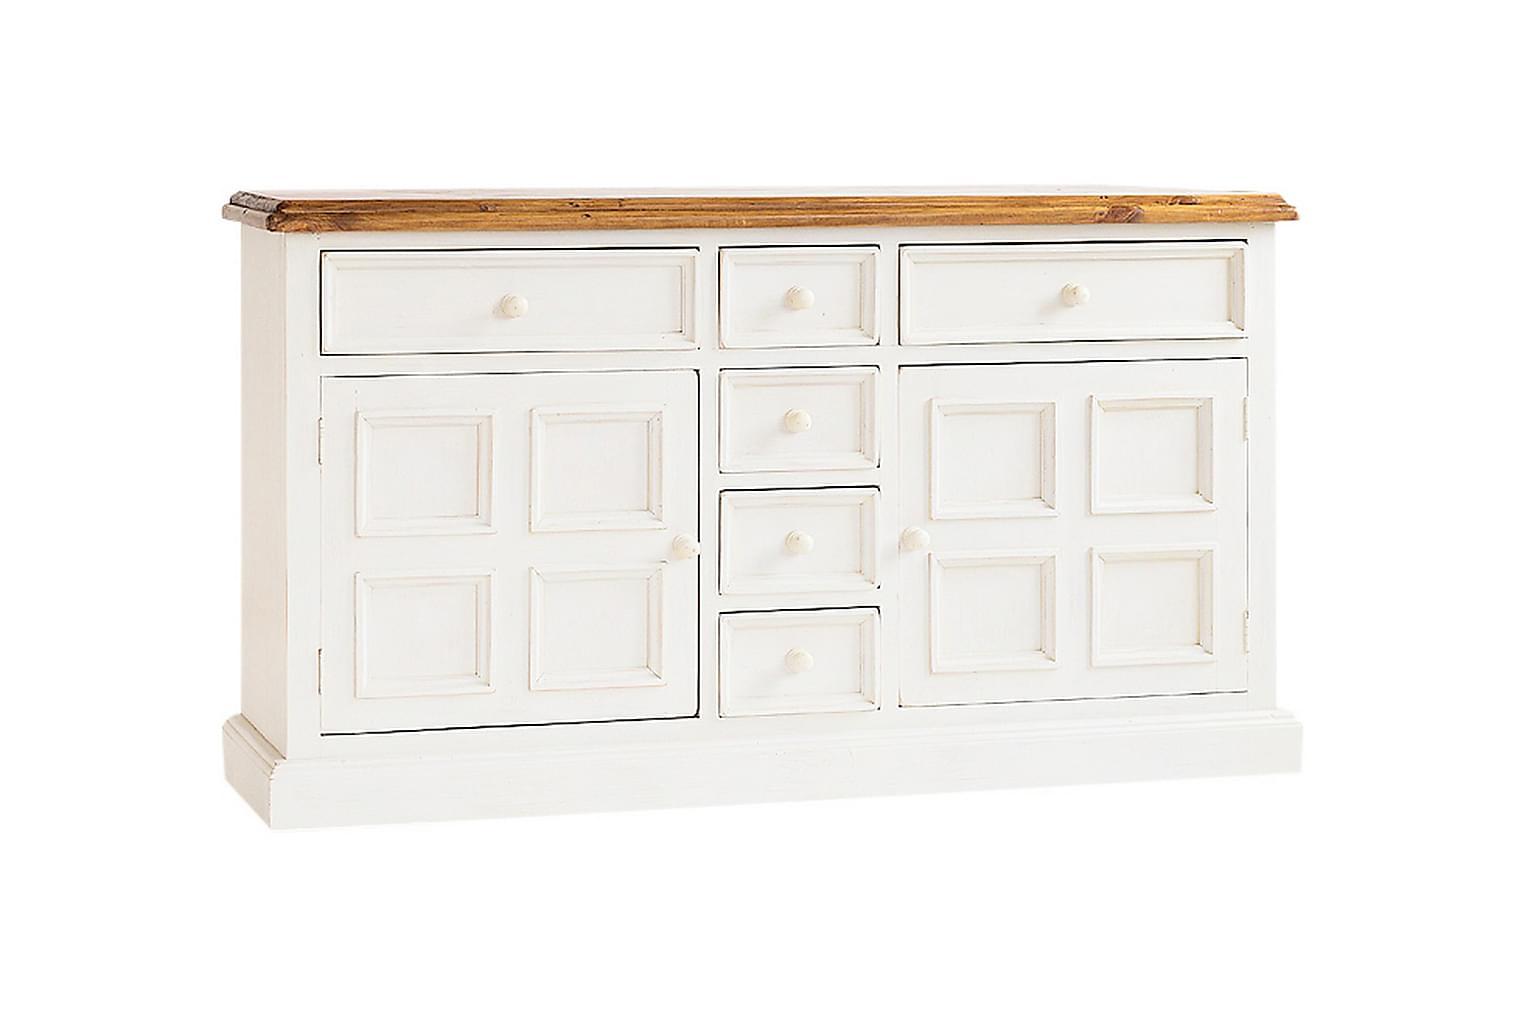 Bodde BODDE Sideboard 160 Vit/Honungslasyr -